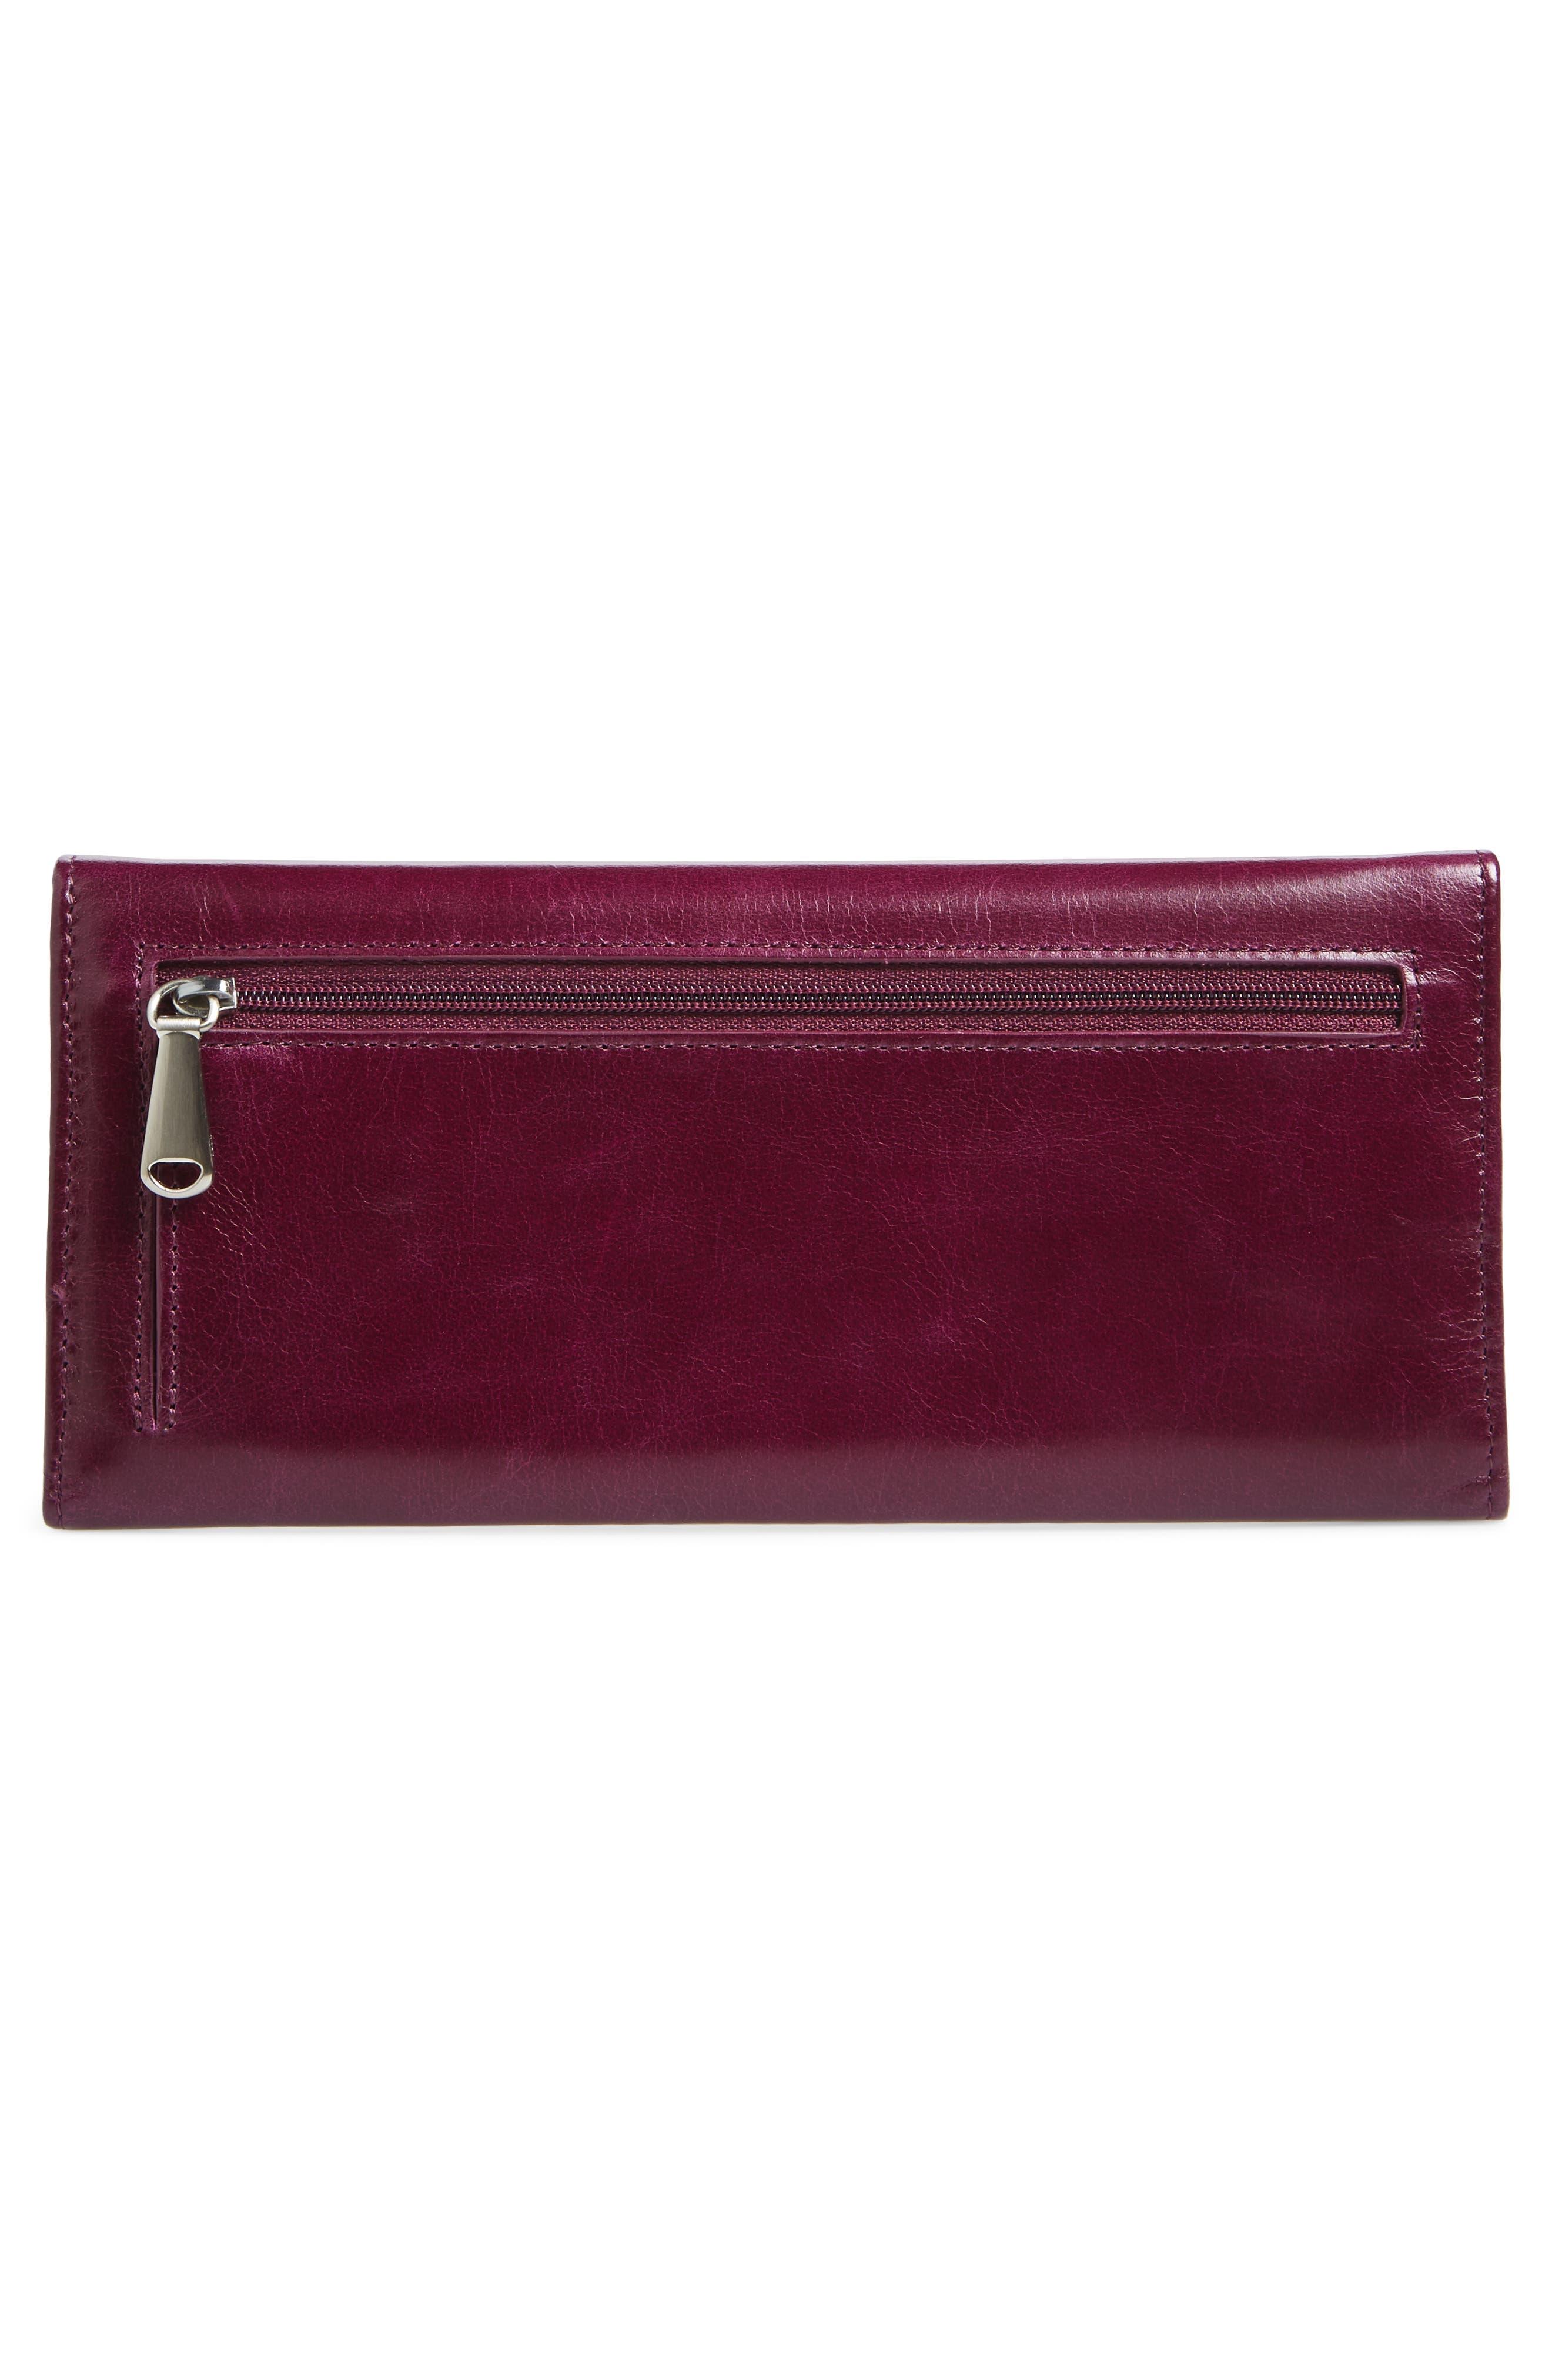 'Sadie' Leather Wallet,                             Alternate thumbnail 109, color,